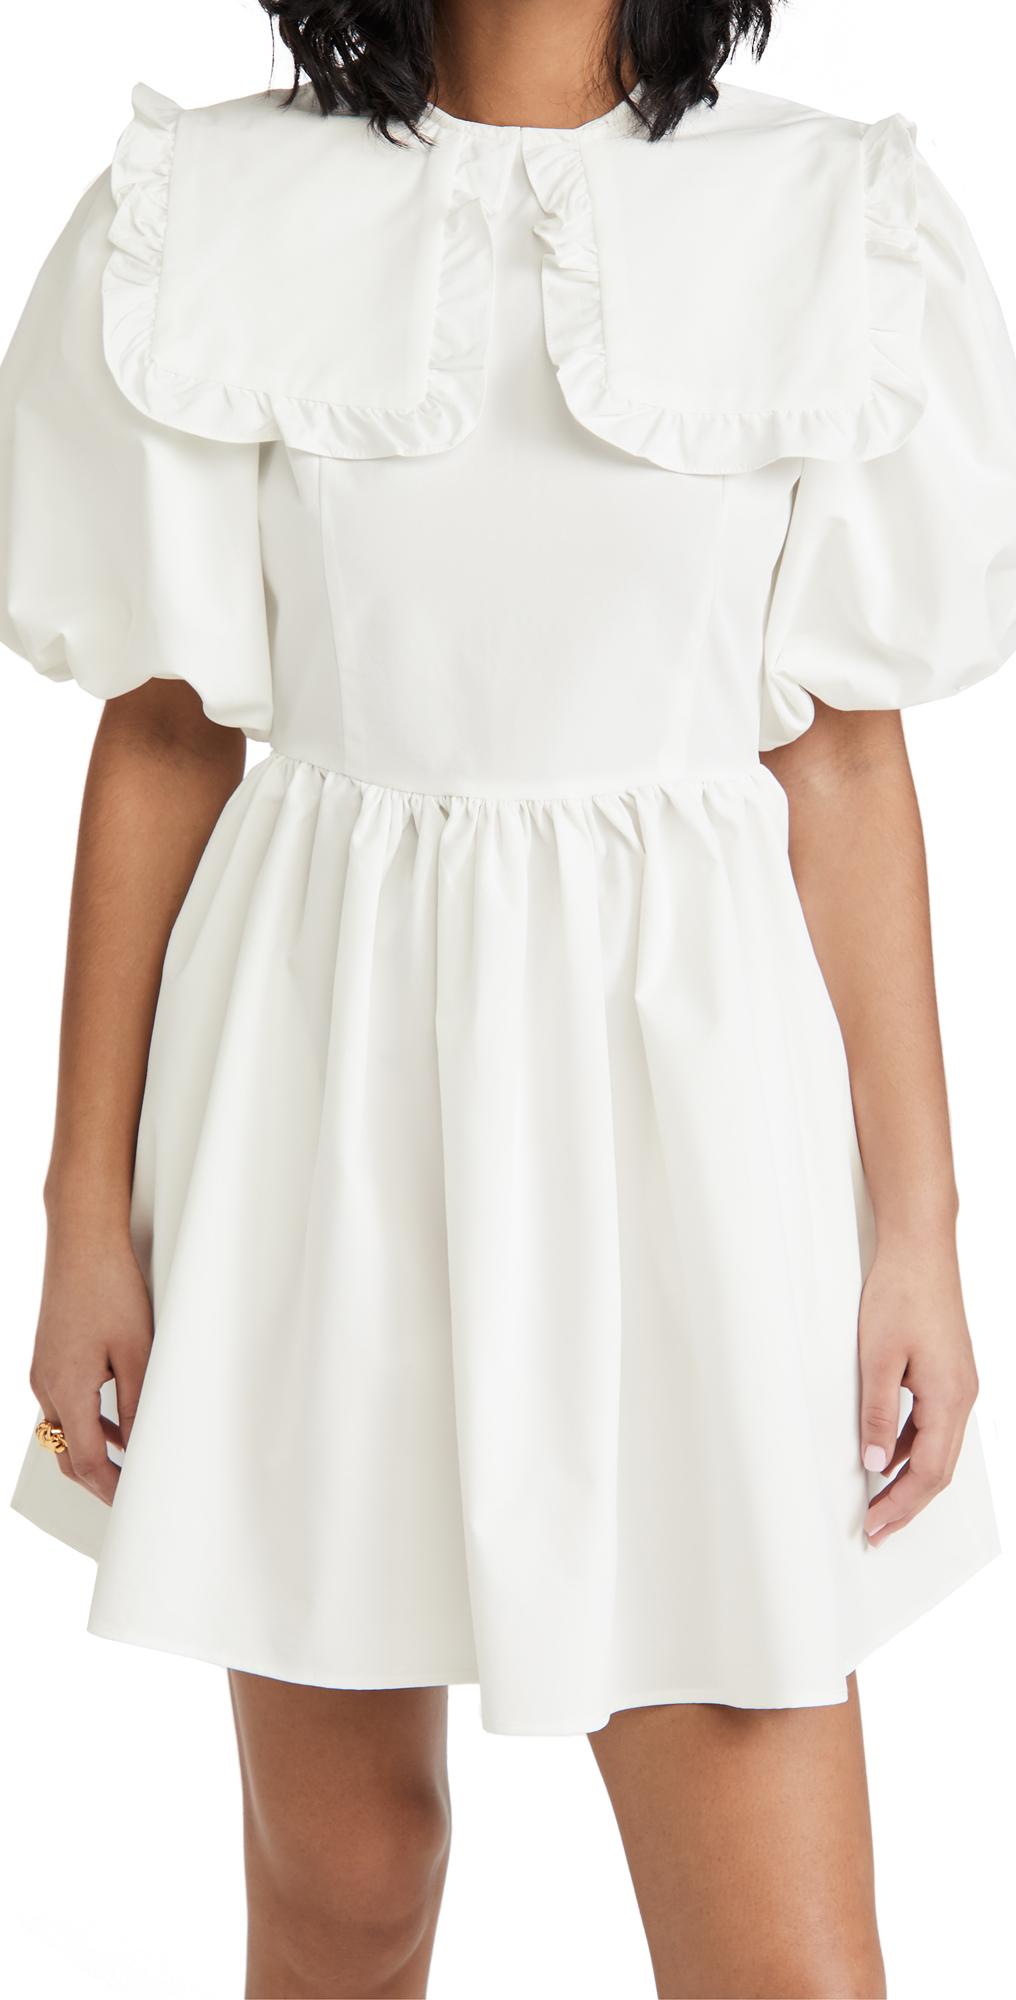 Sister Jane Skip The Queue Mini Dress